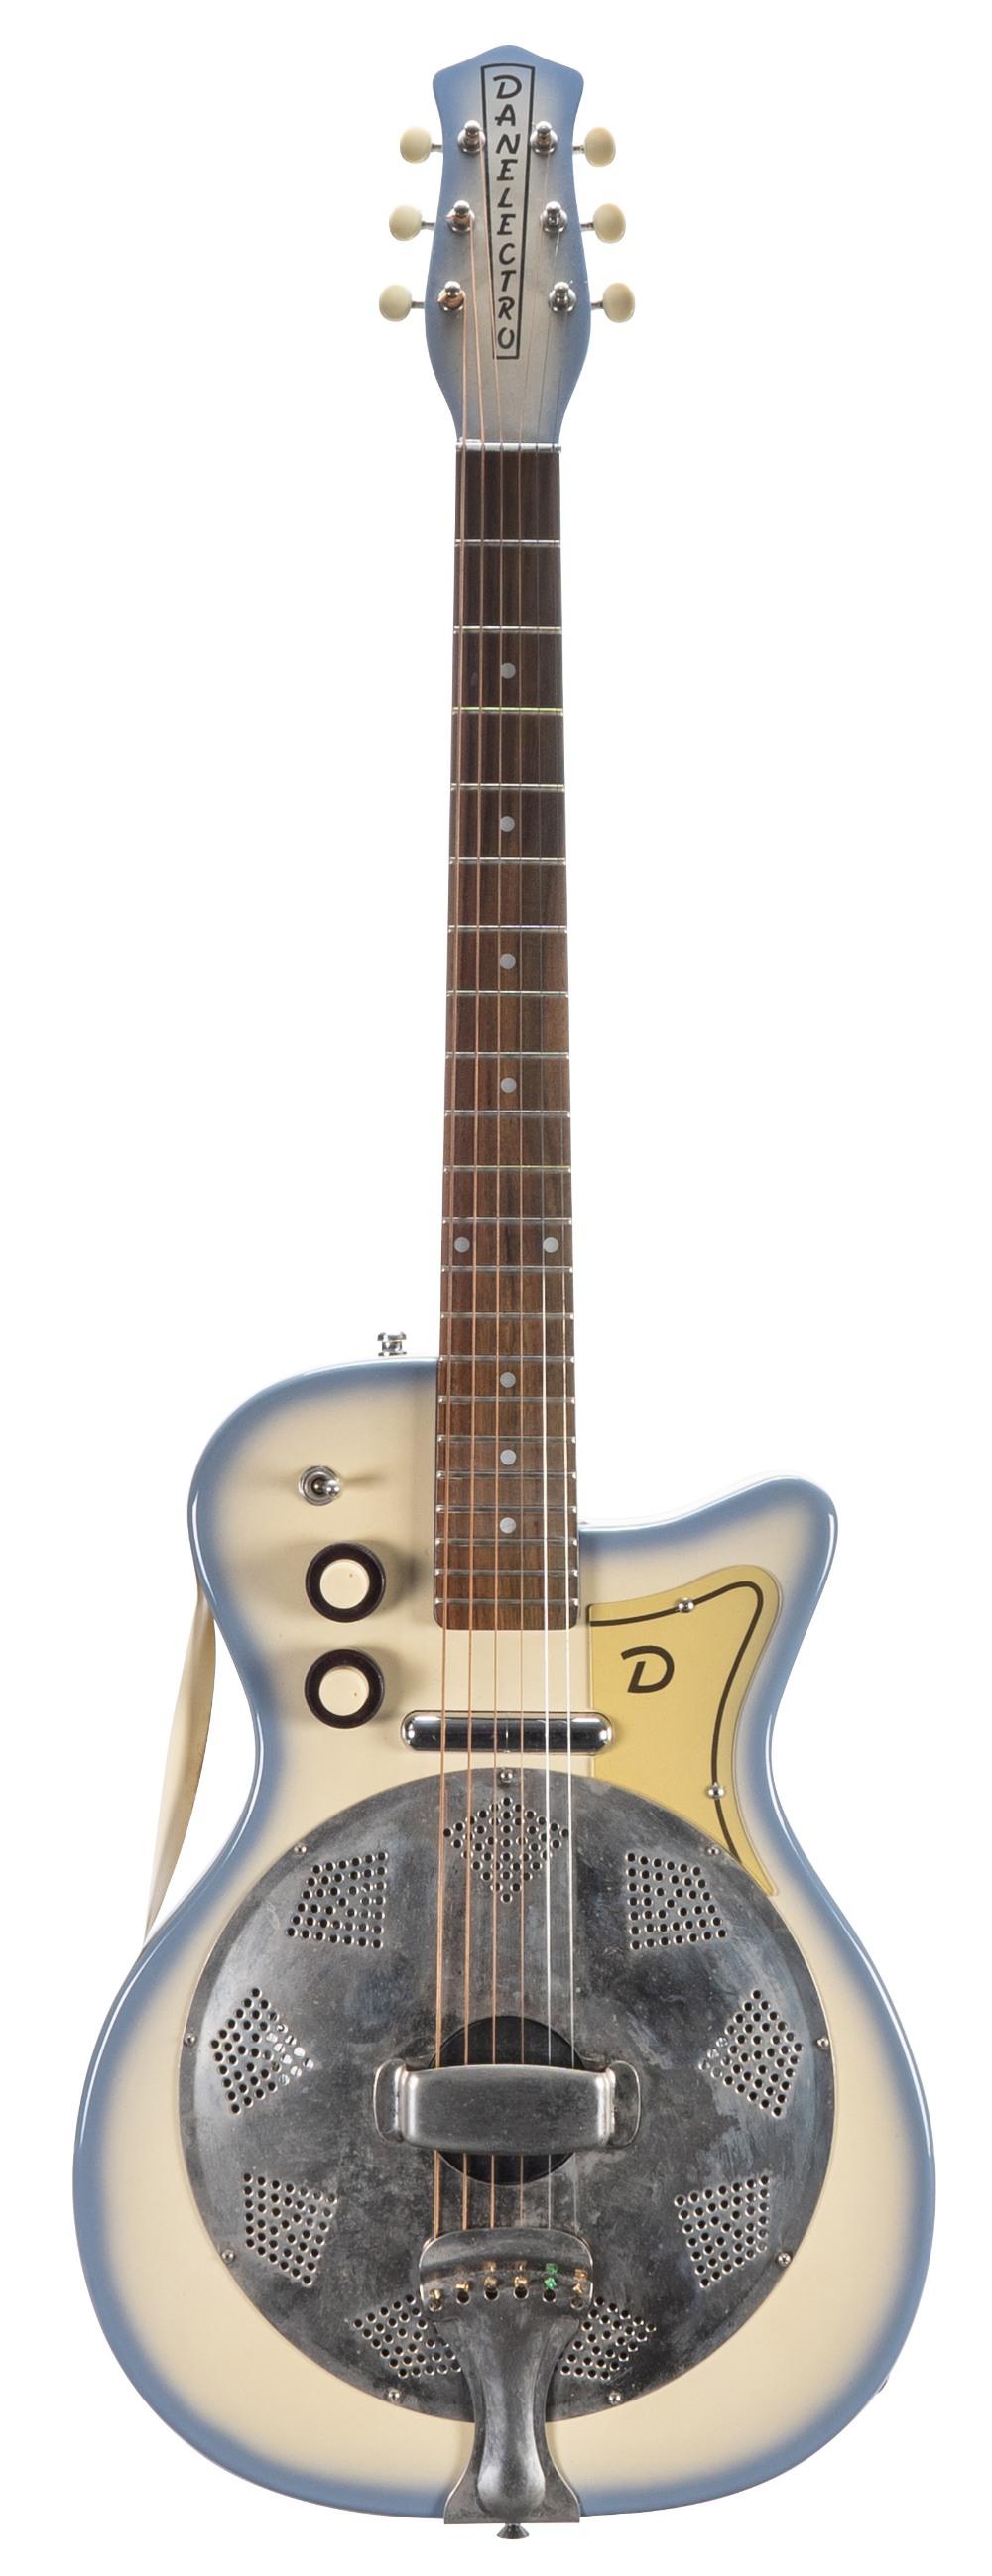 1990s Danelectro Resodan electric guitar, made in Korea; Finish: blue burst; Fretboard: rosewood;